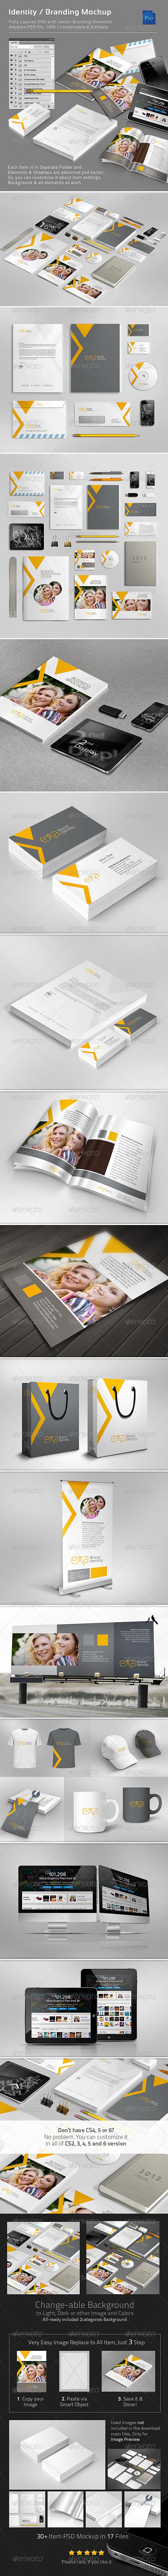 GraphicRiver Identity Branding Mock-Ups 4575751